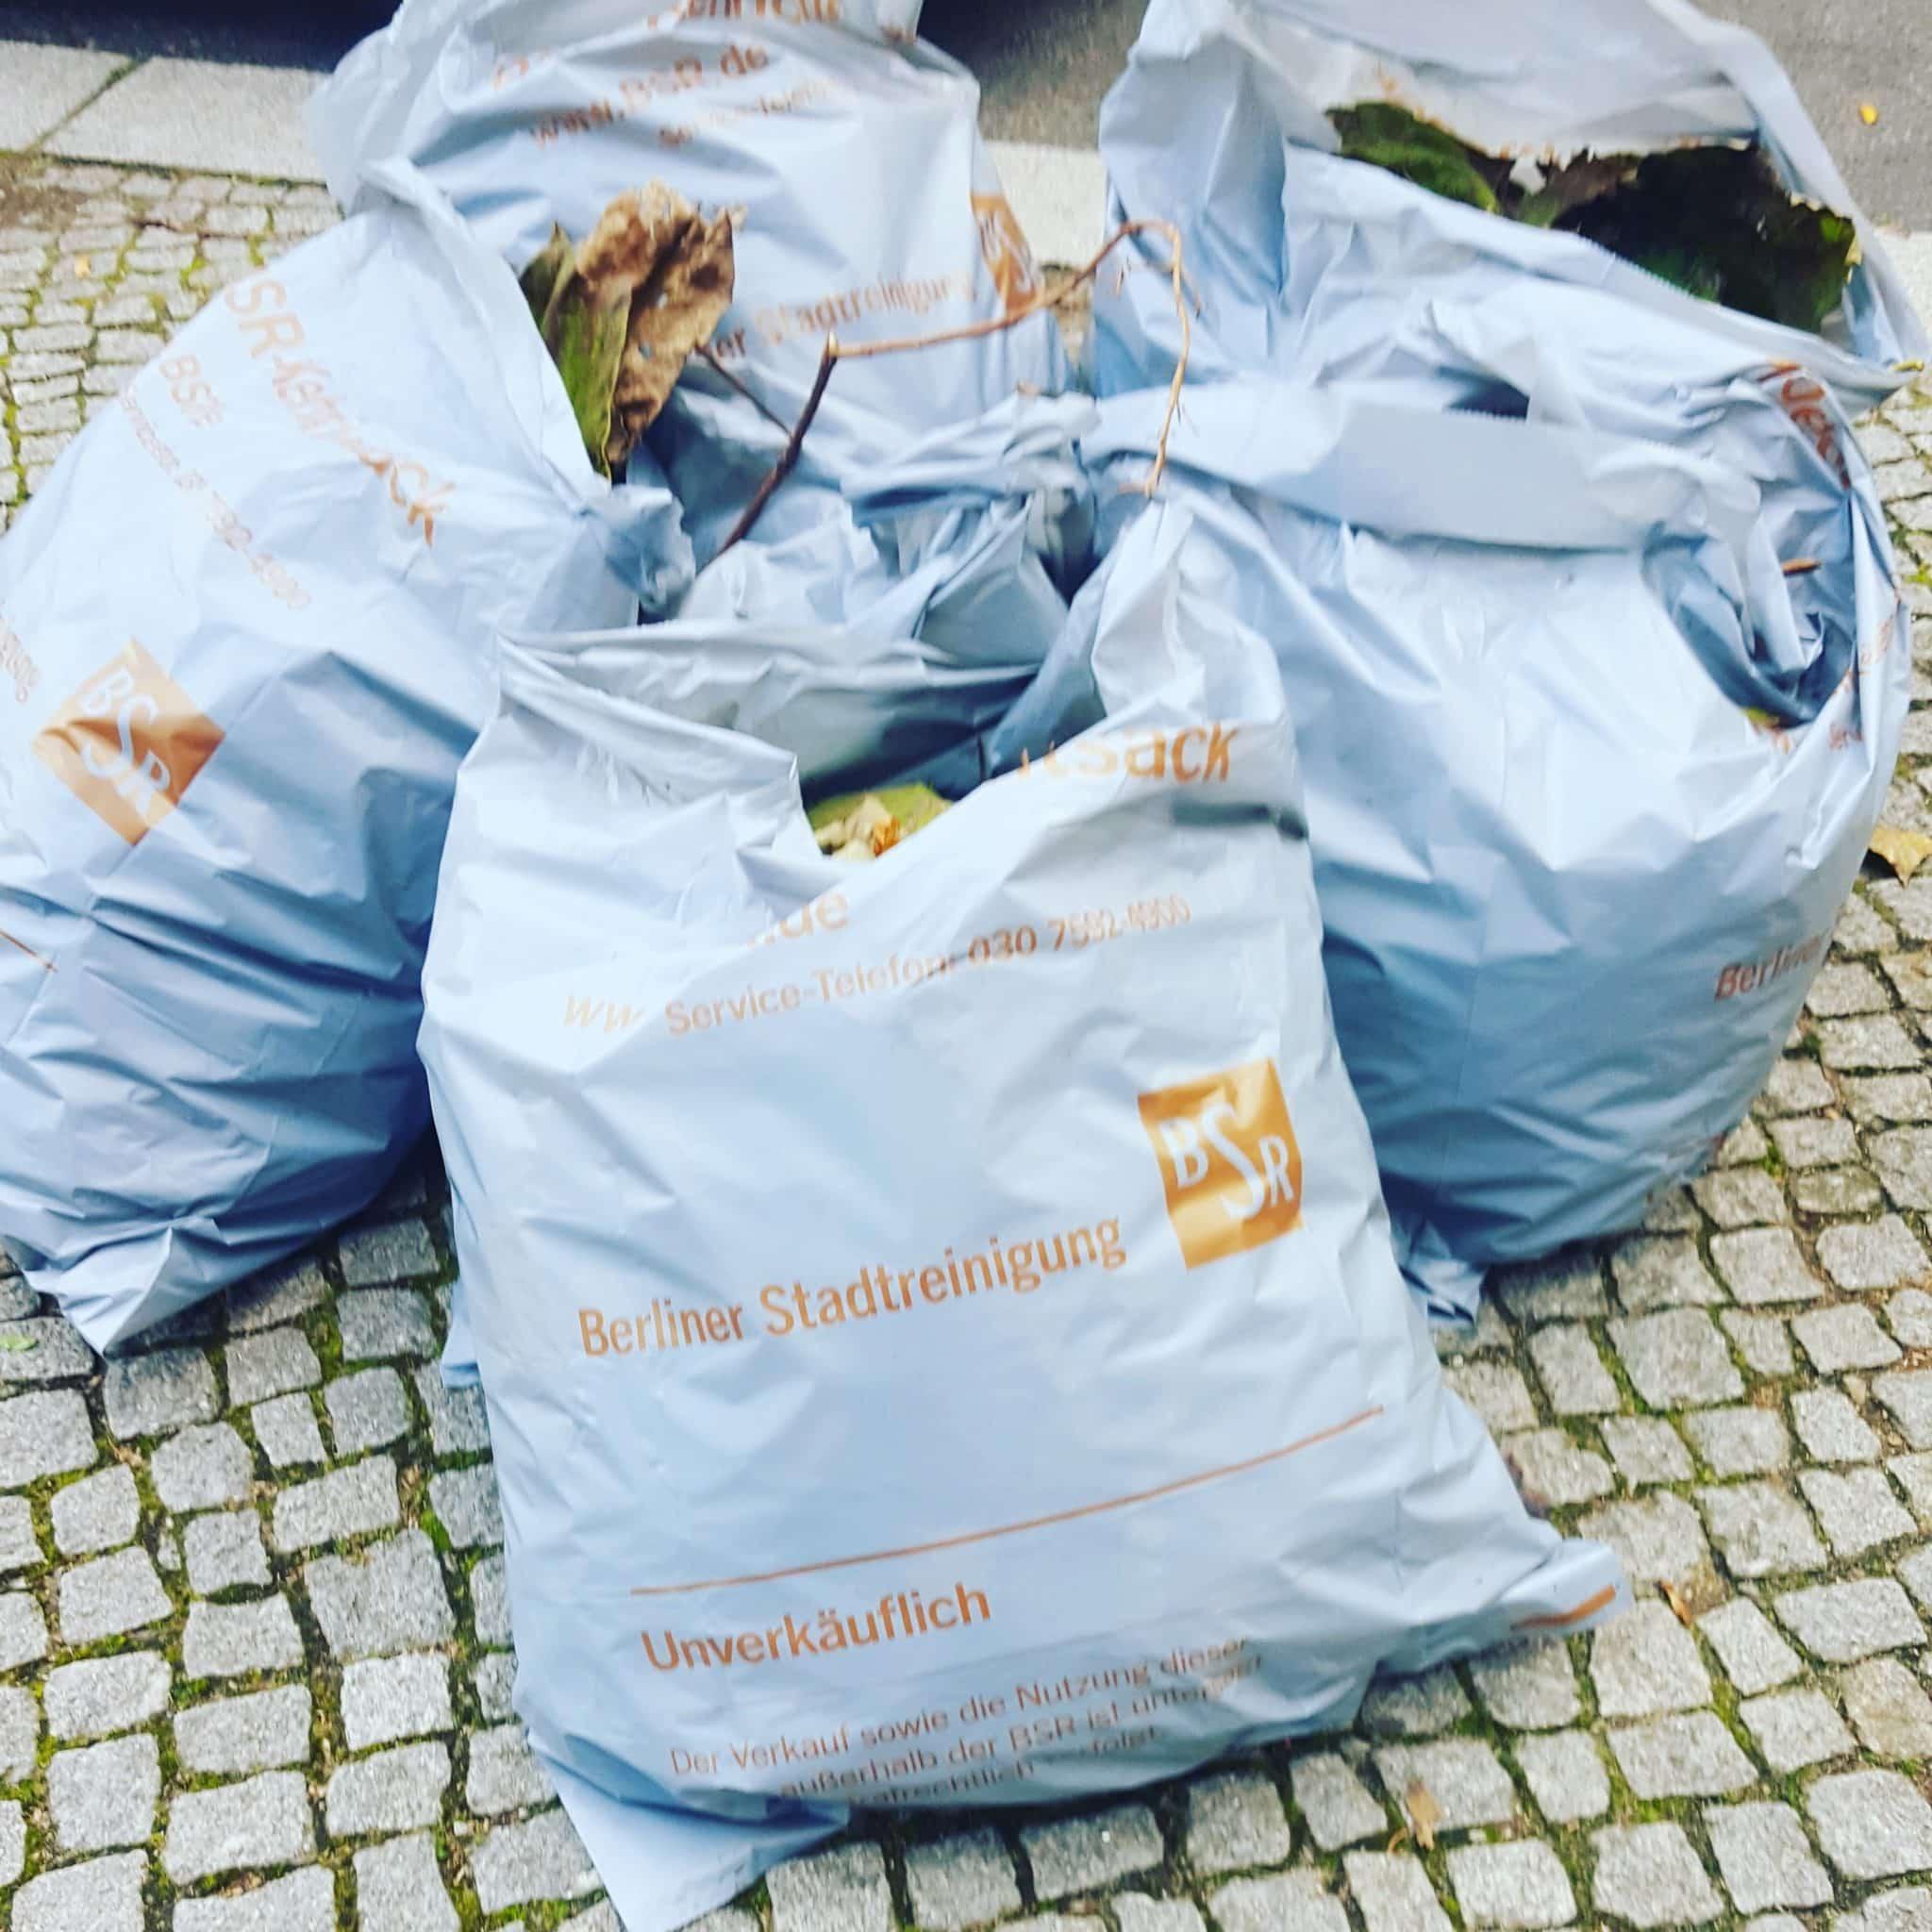 Berlin räumt auf Oktober